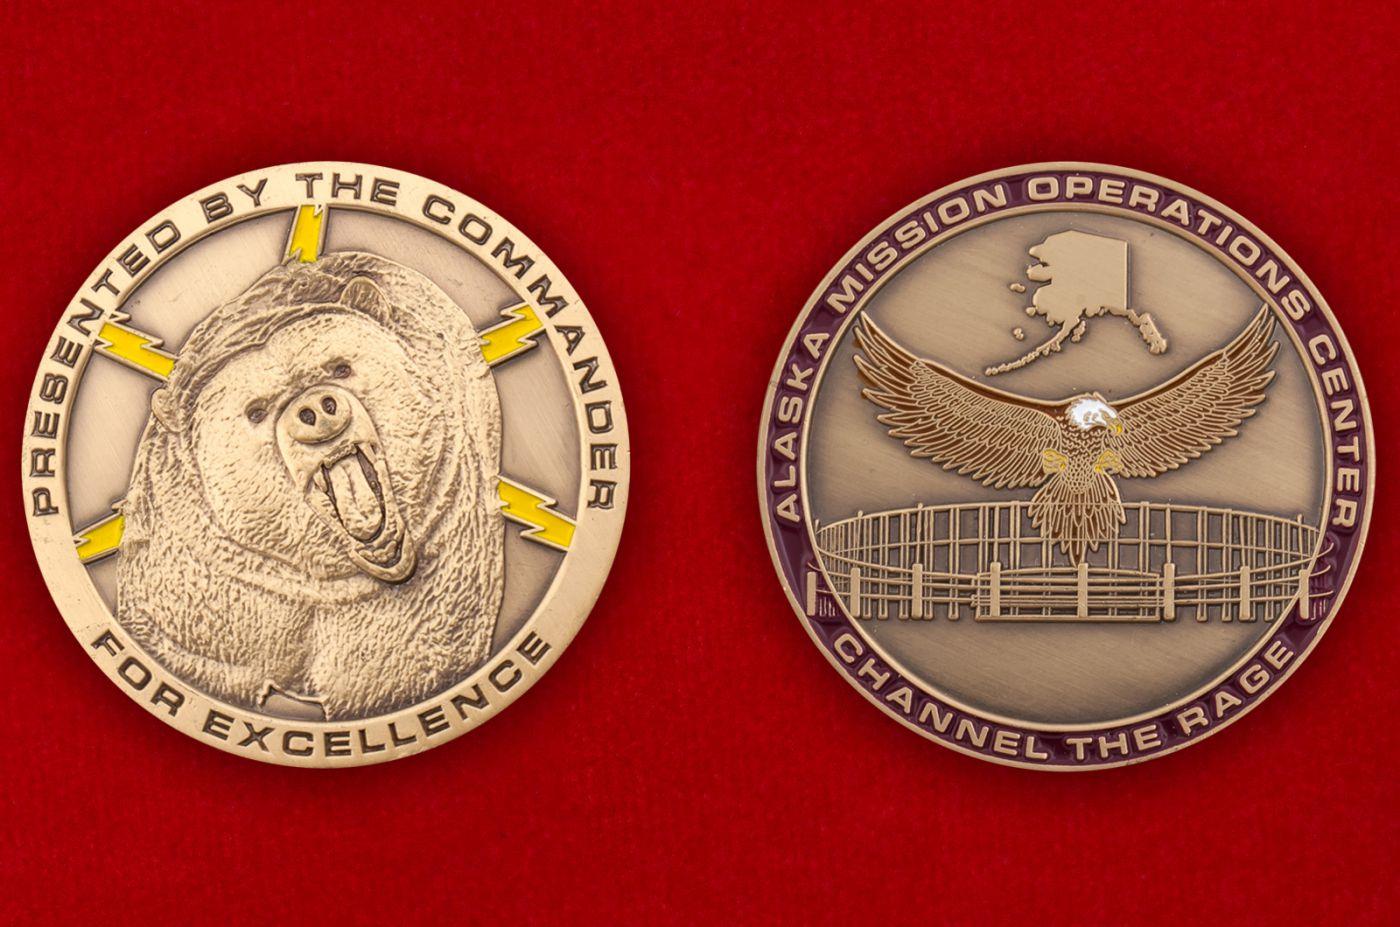 Челлендж коин Центра Управления полетами ВВС США на Аляске - аверс и реверс